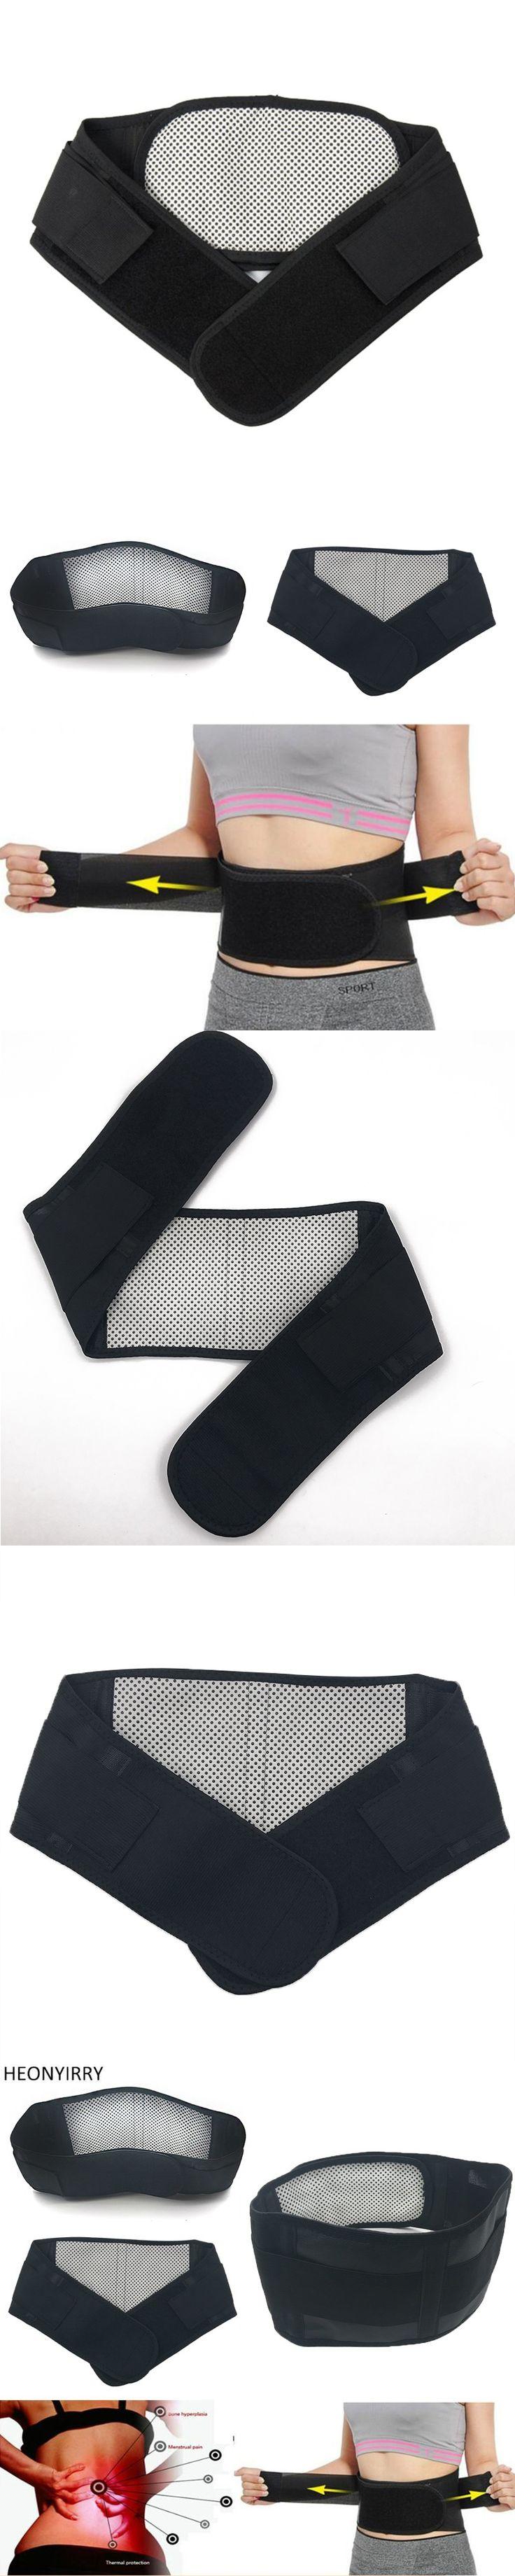 Adjustable Tourmaline Self-heating Magnetic Therapy Waist Belt Lumbar Support Back Waist Support Brace Double Banded faja lumbar